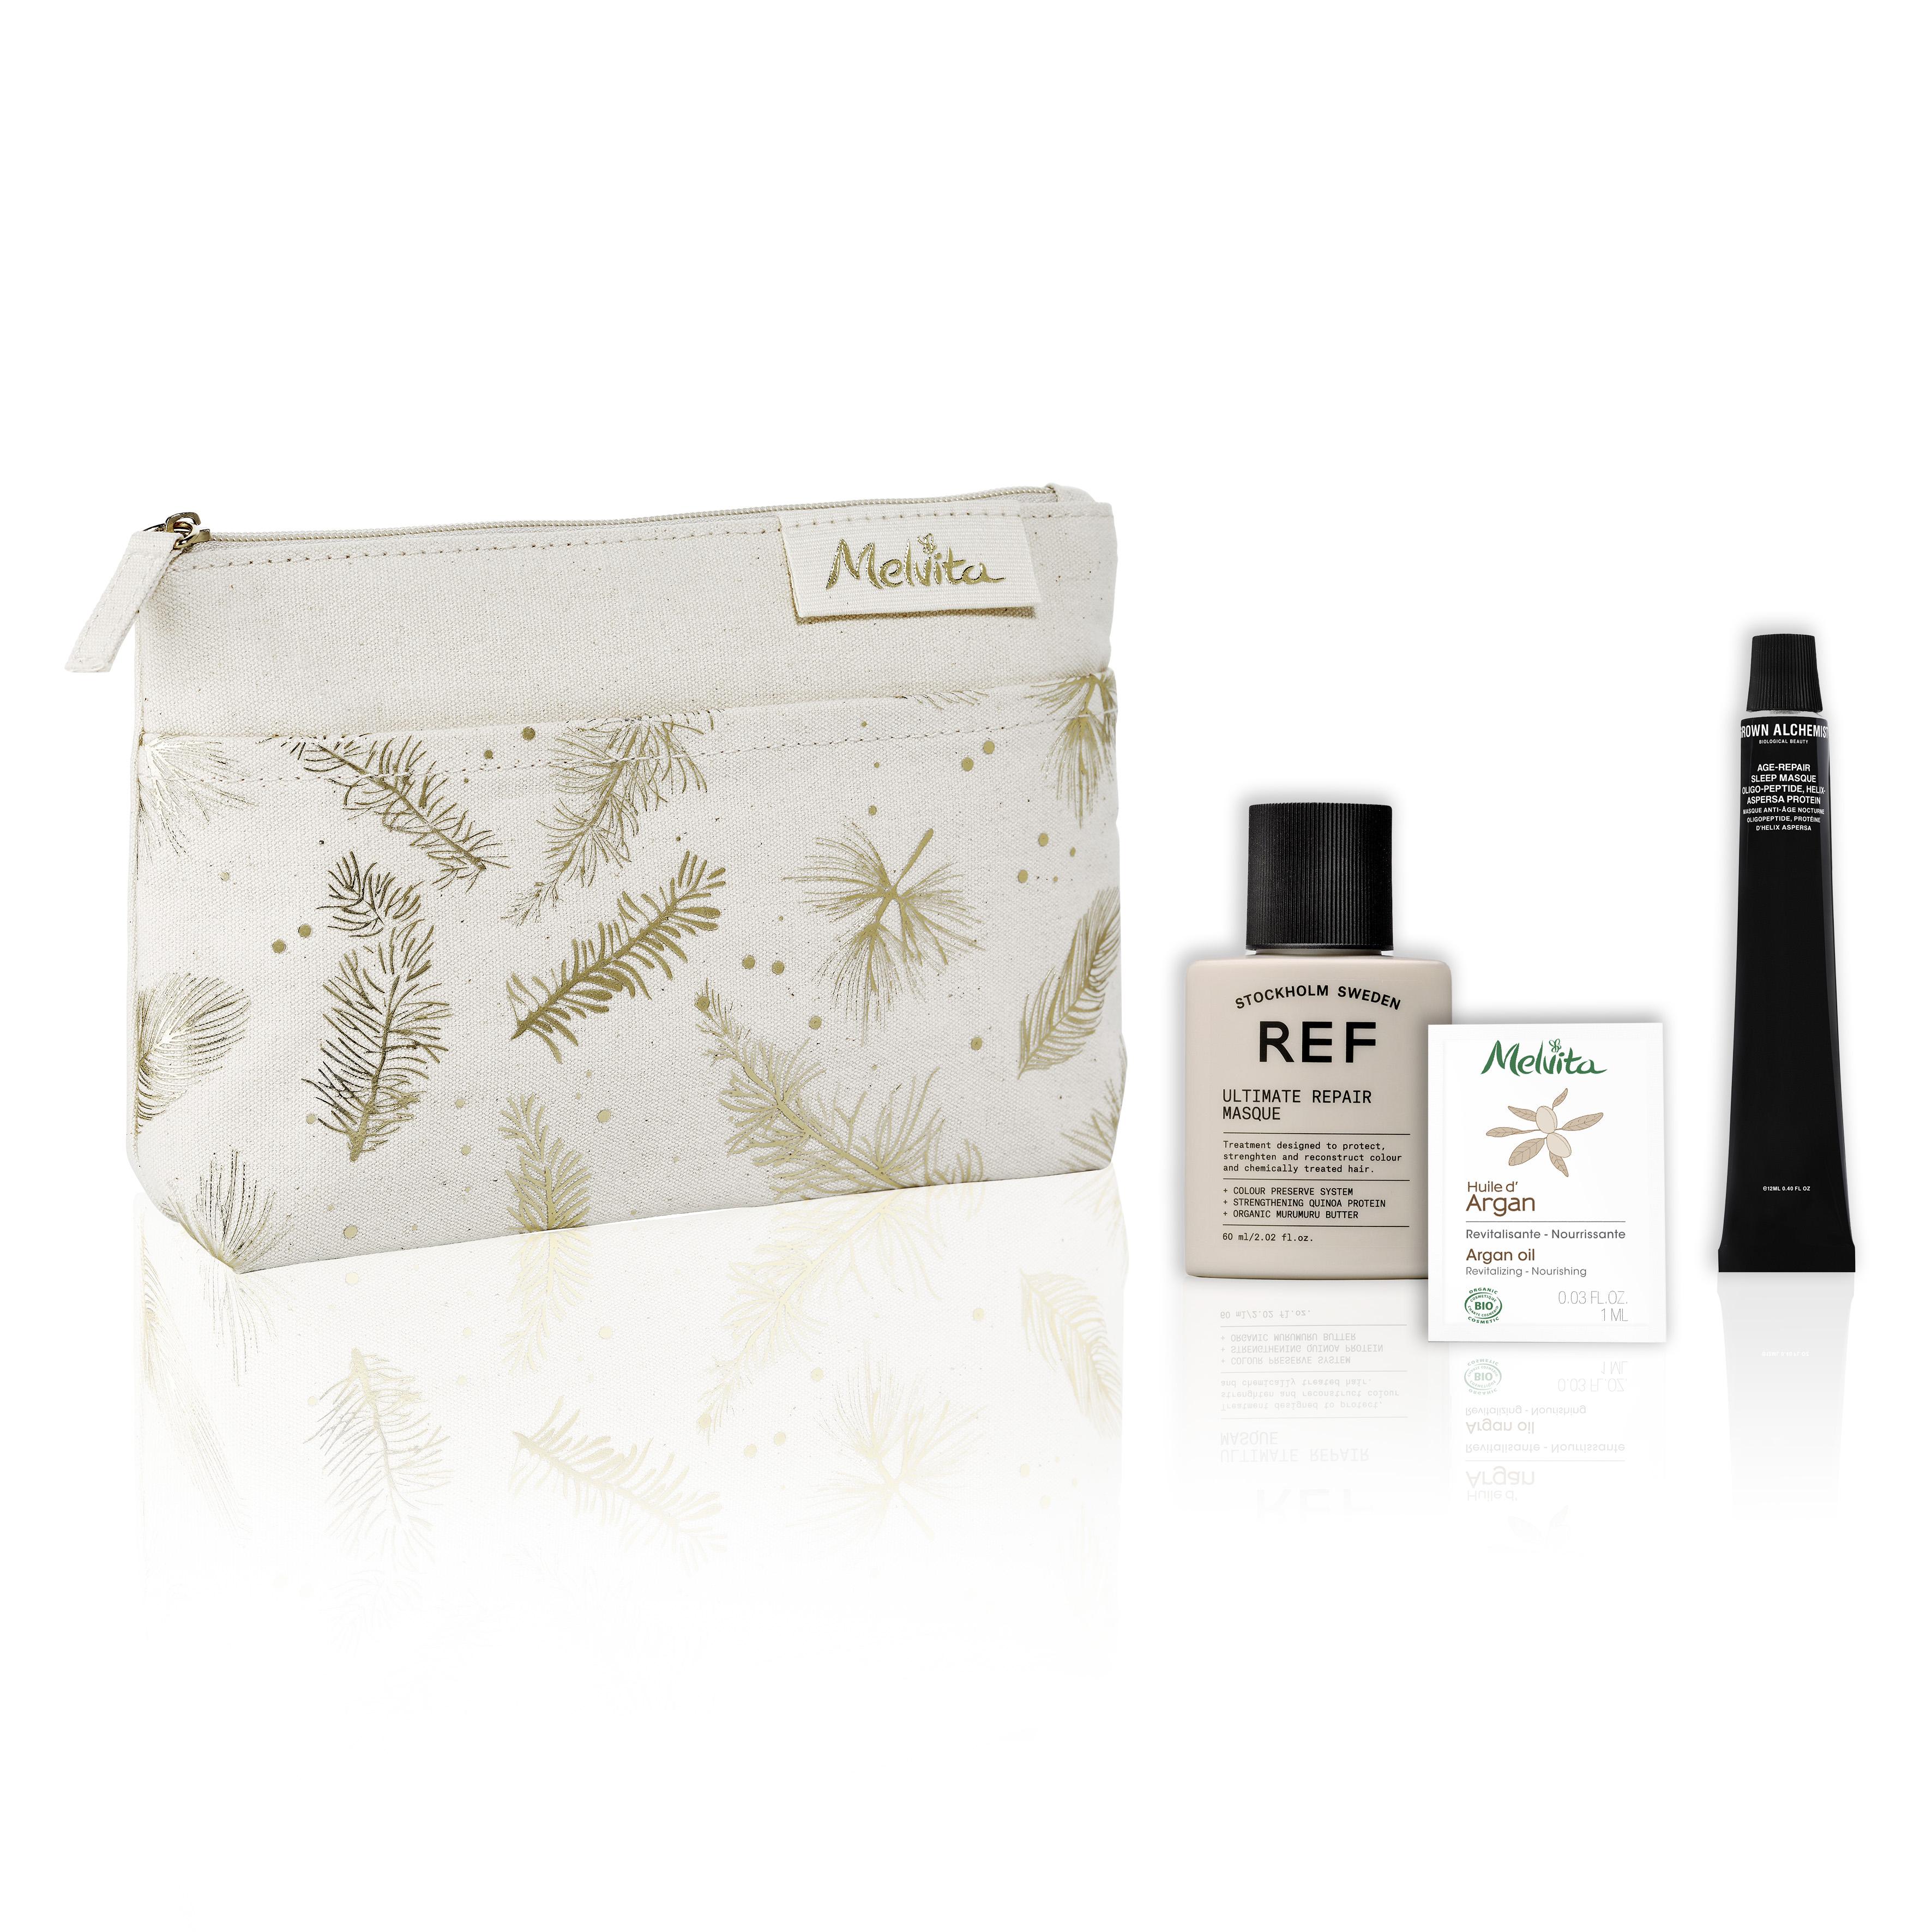 Kosmetická taštička Melvita s produkty Grown Alchemist, REF v cestovním balení a vzorkem bio arganového oleje od Melvity.